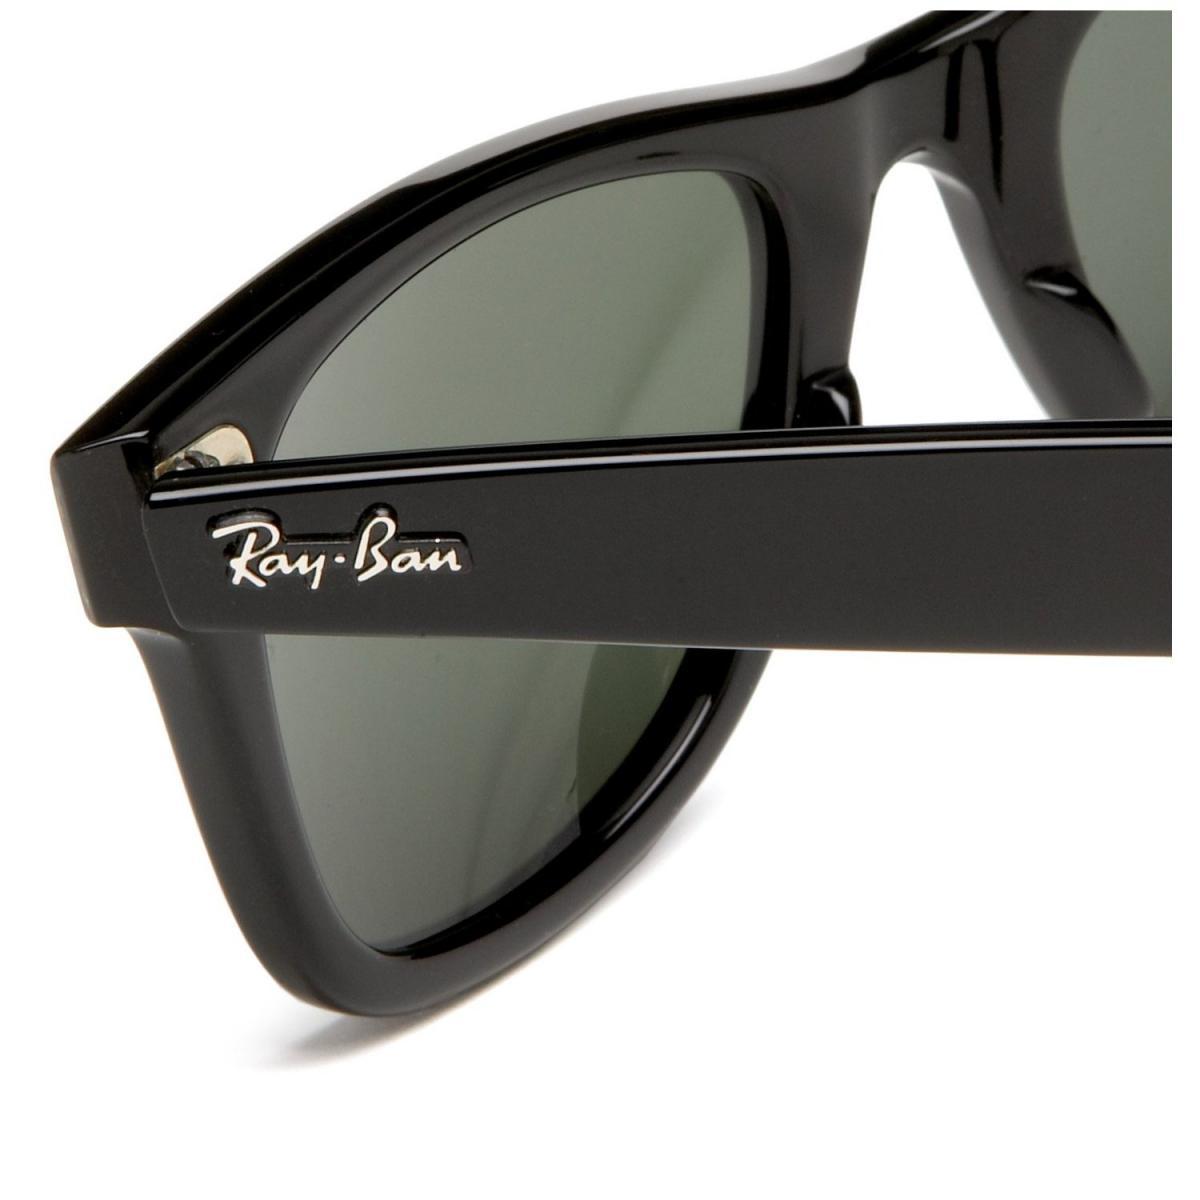 Плашка с логотипом «Ray-Ban» на дужках оригинальных очков Ray-Ban Wayfarer 9503884781110